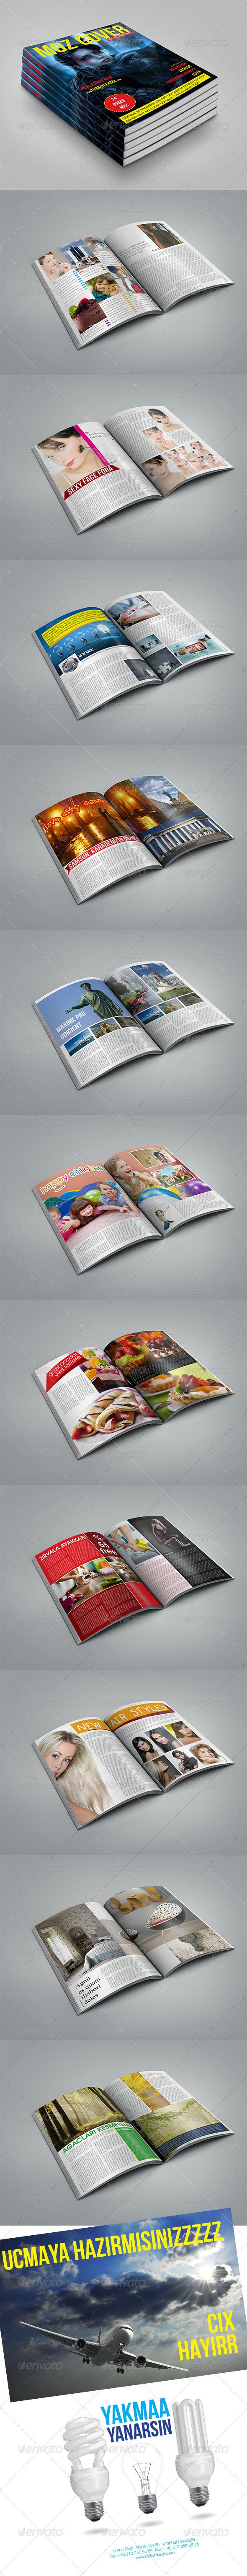 MGZ Magazine Template - Magazines Print Templates